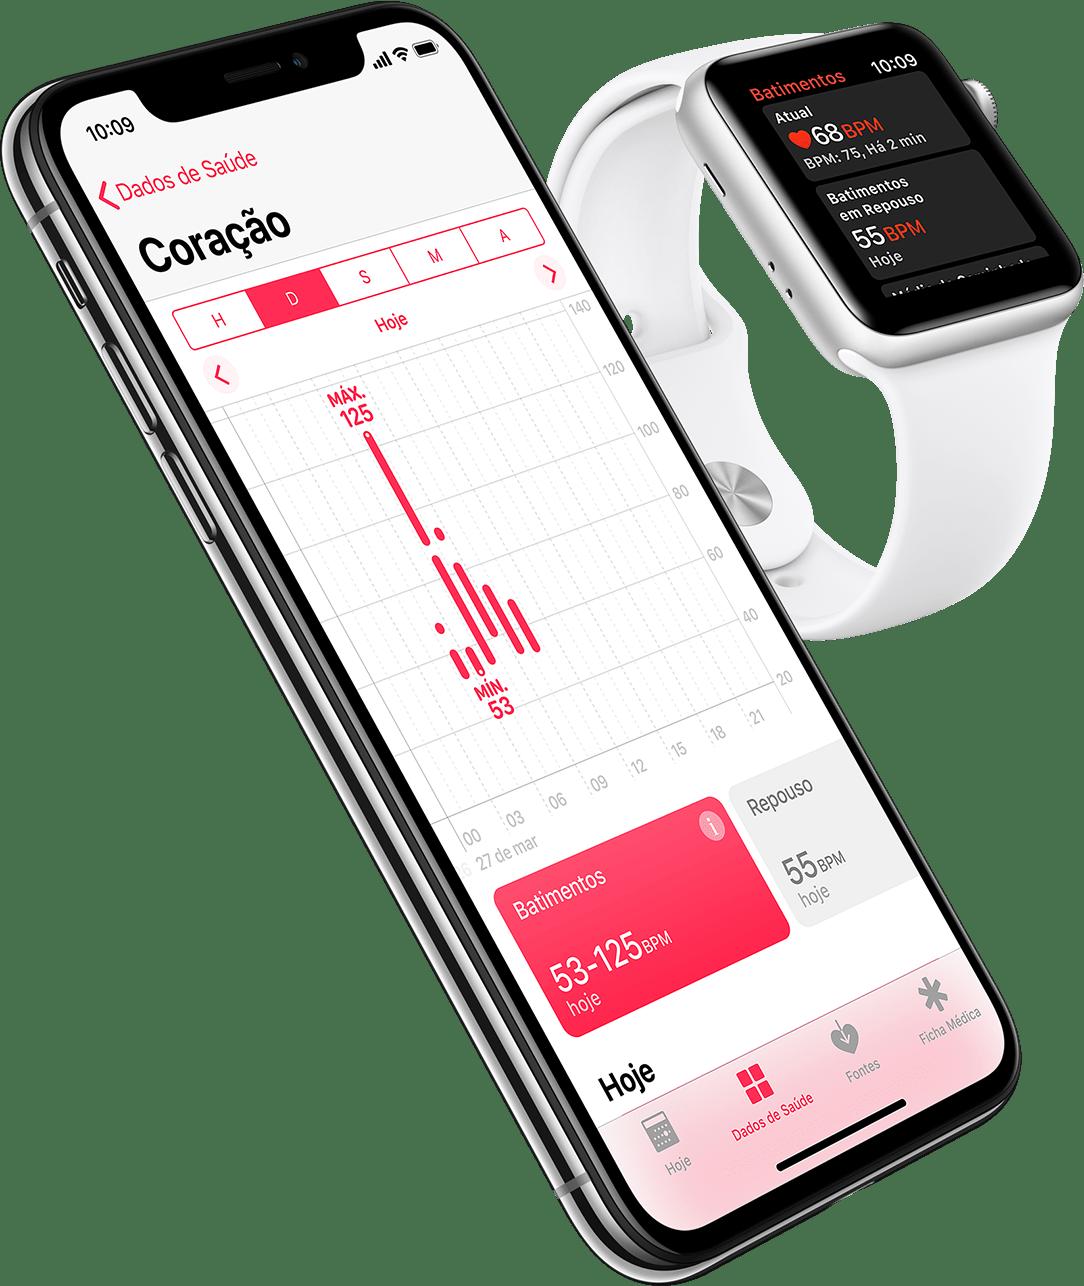 Monitoramento cardíaco no iPhone X e no Apple Watch Series 3